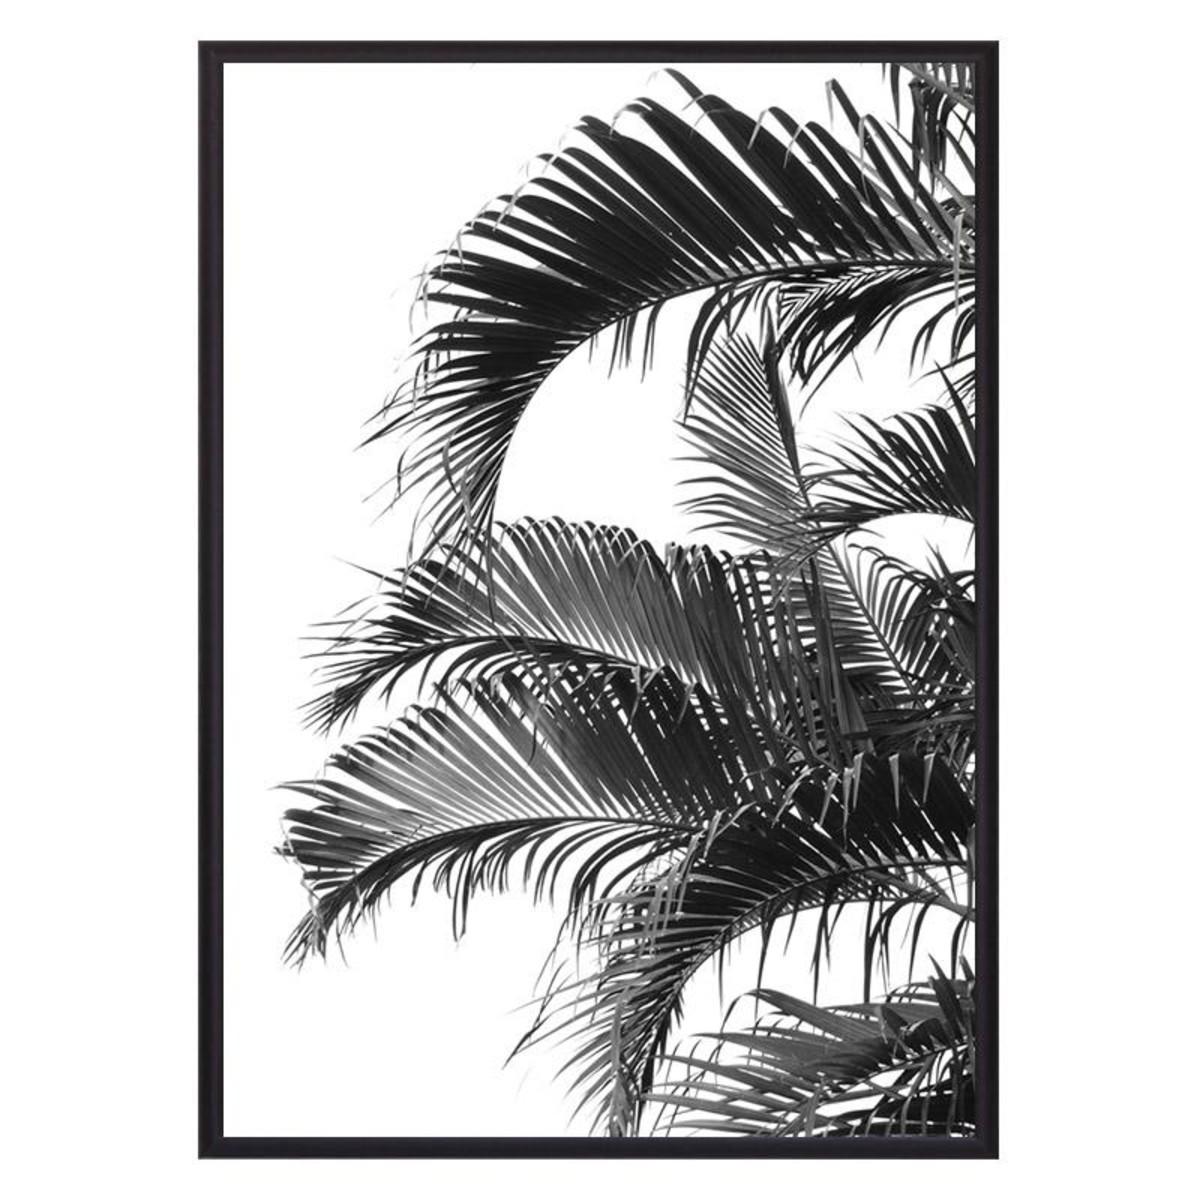 Постер Дом Корлеоне Пальмовые листья 07-0446-21х30 21х30 см